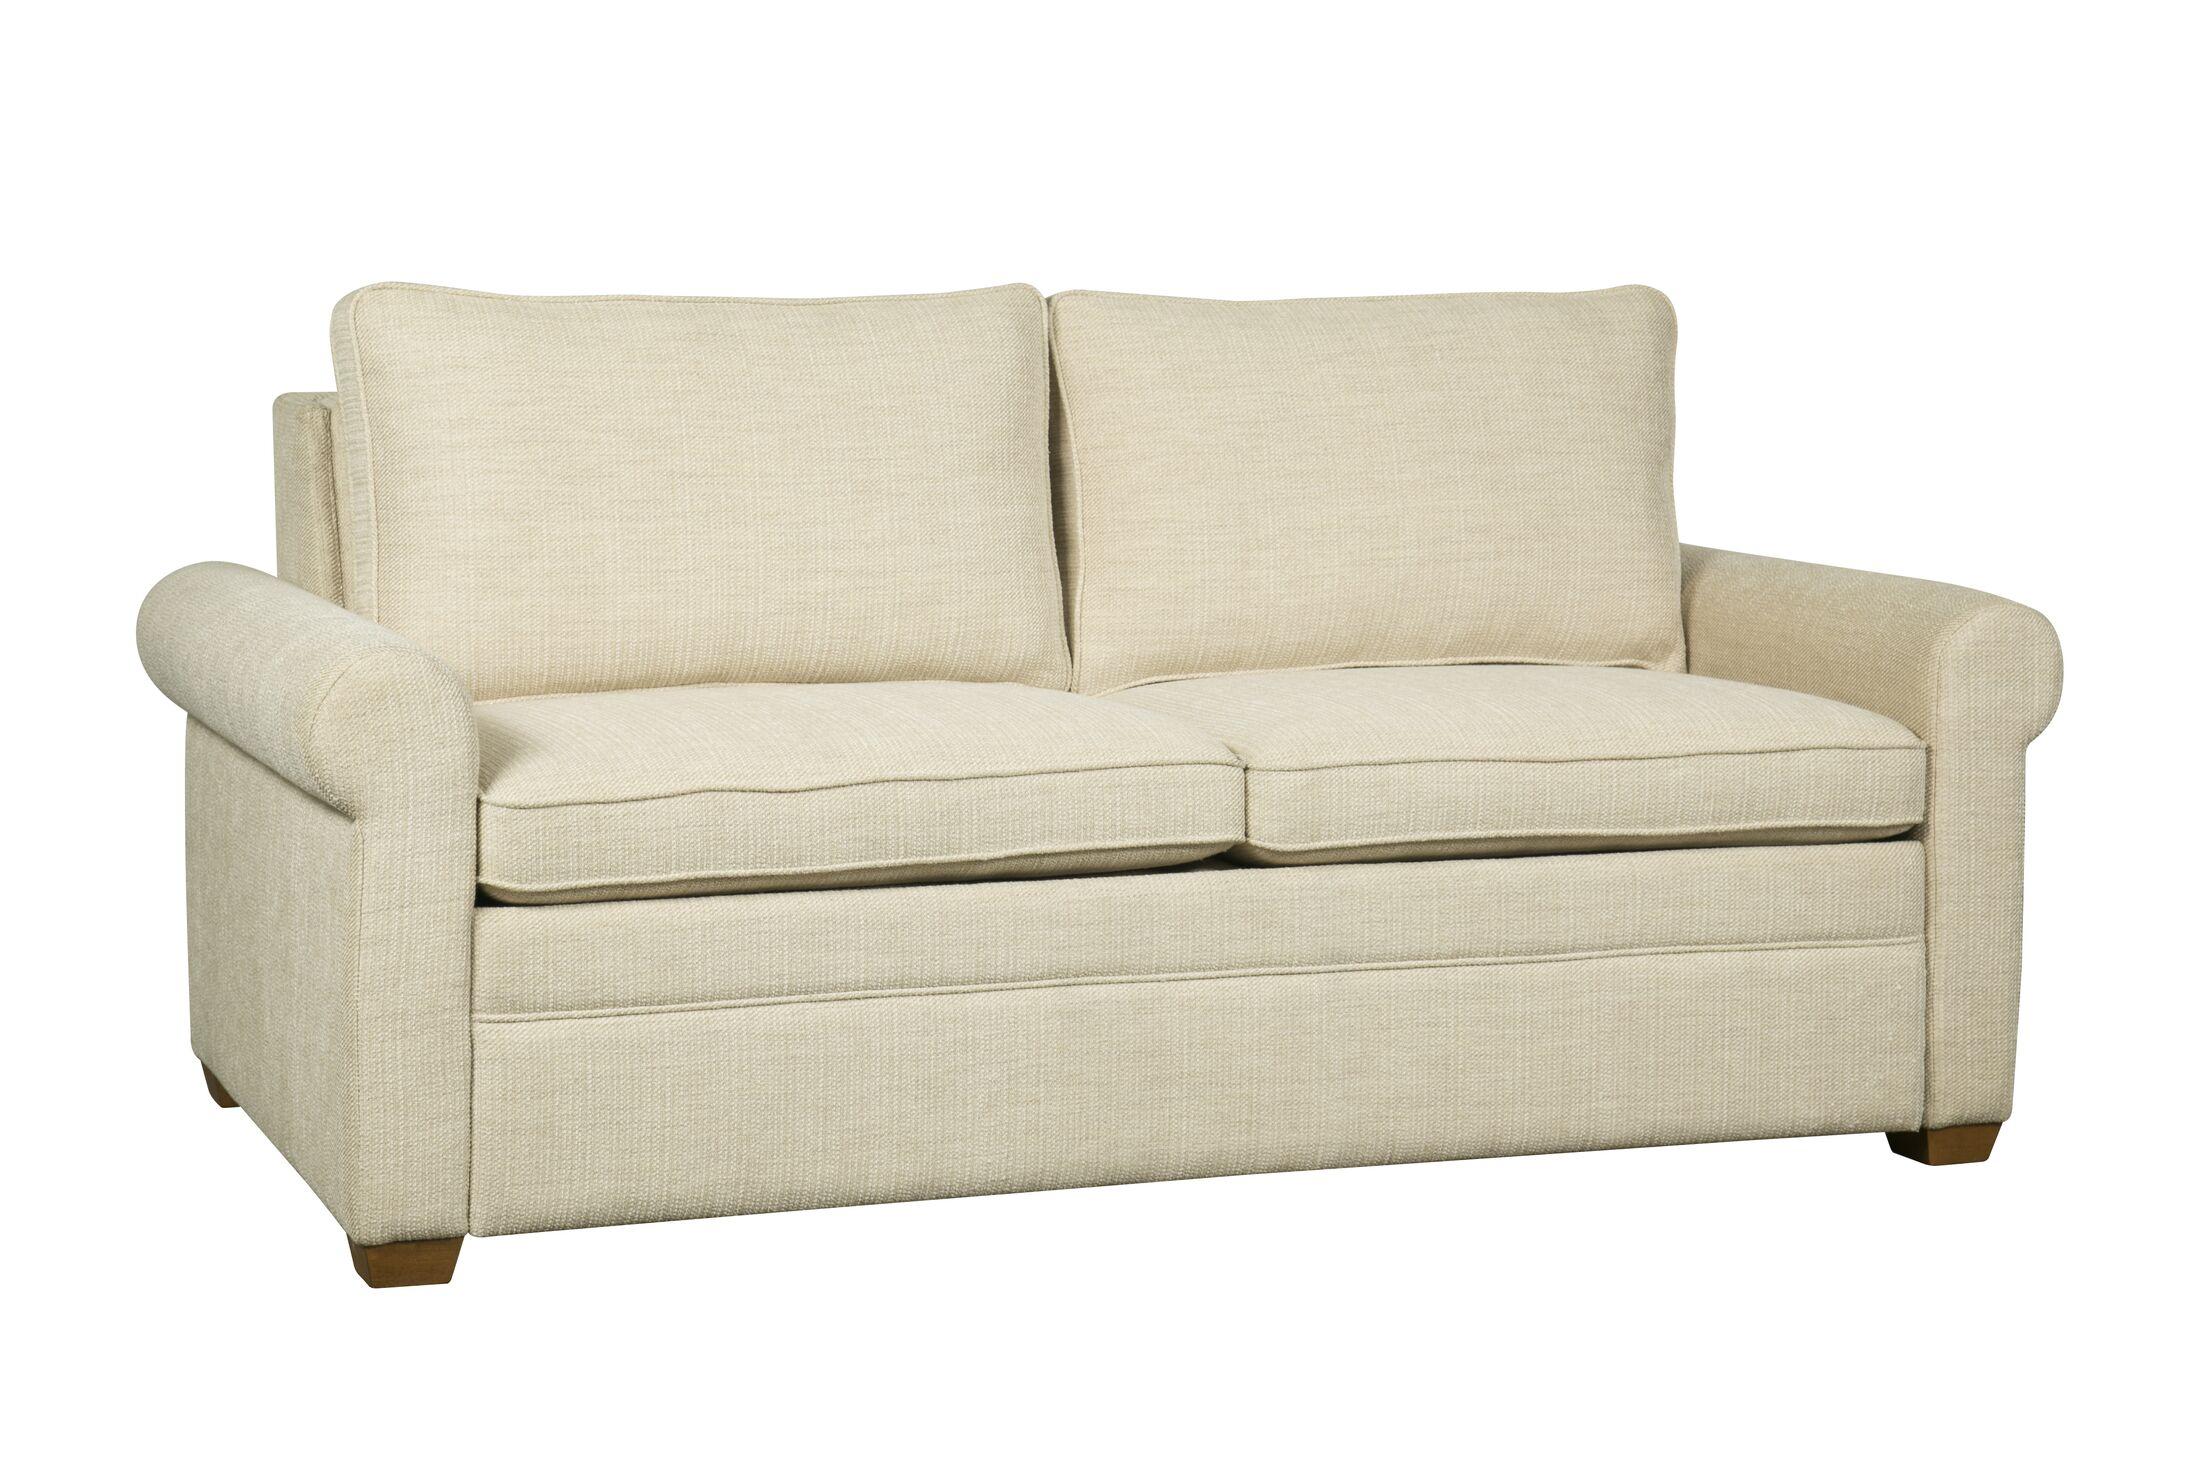 Kipling Sleeper Sofa Mattress Type: Queen Plus, Upholstery: White Linen